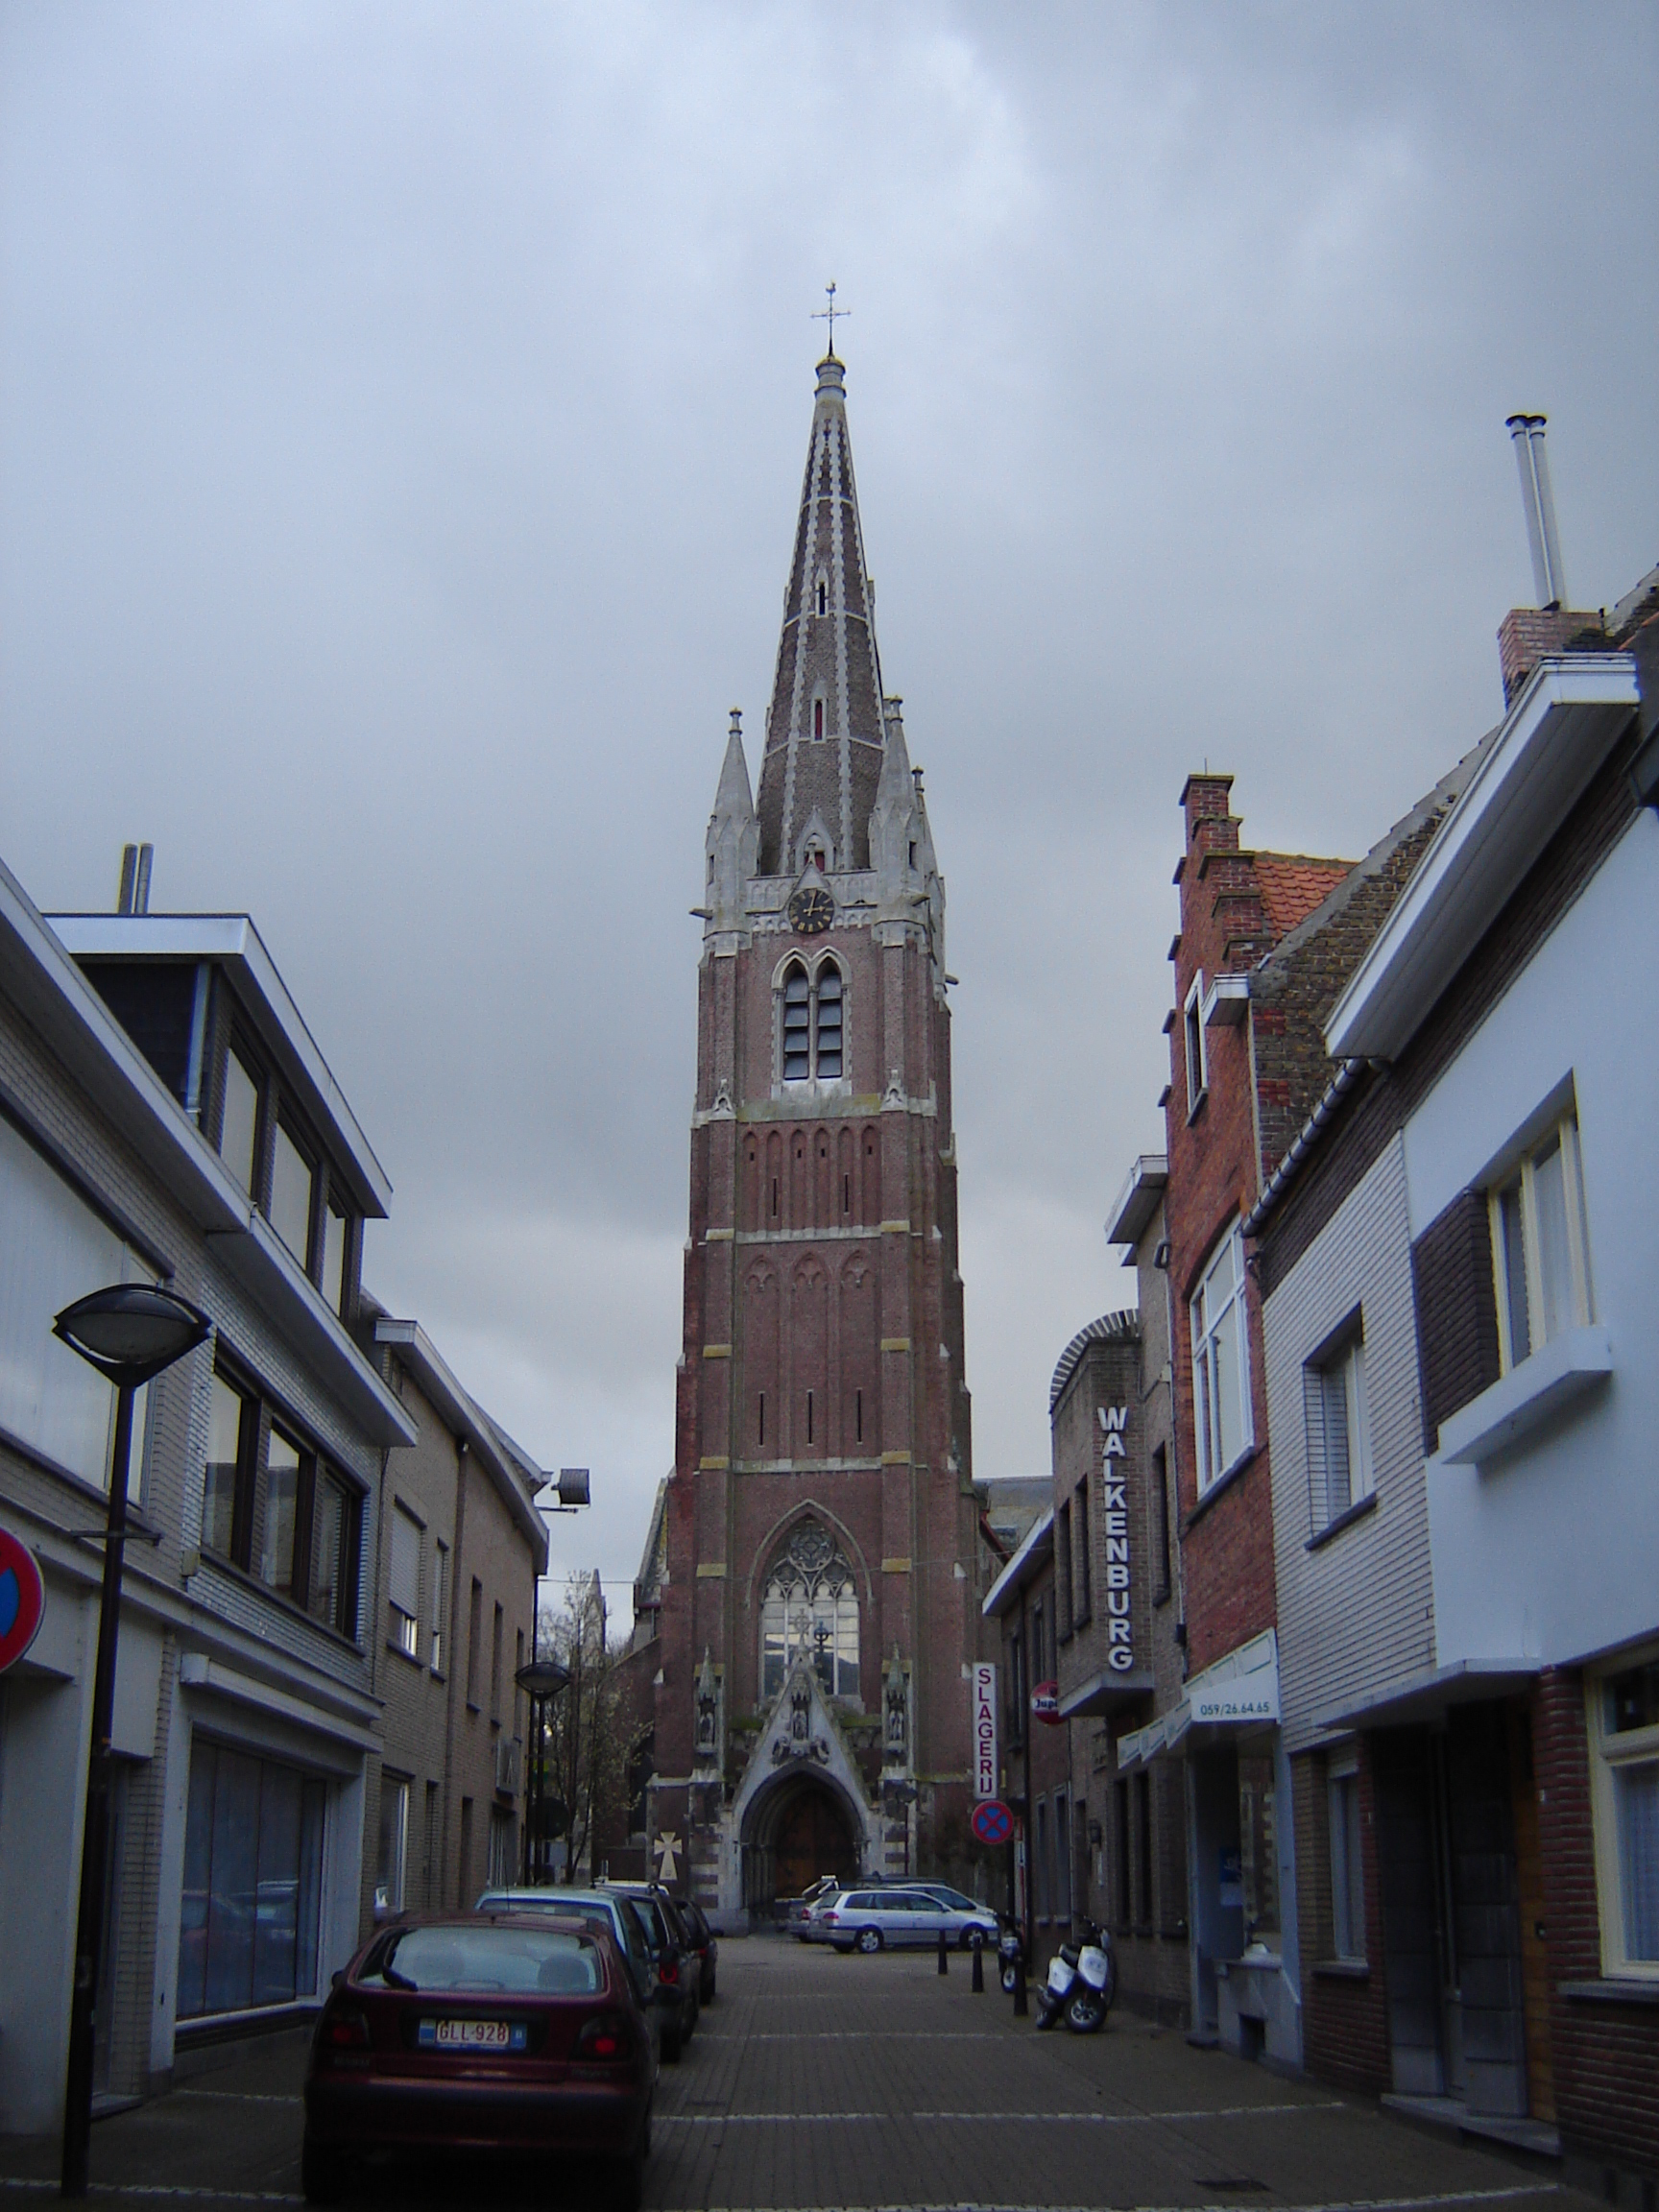 Oudenburg Belgium  City new picture : Bestand:Oudenburg Onze Lieve Vrouwekerk 1 Wikipedia